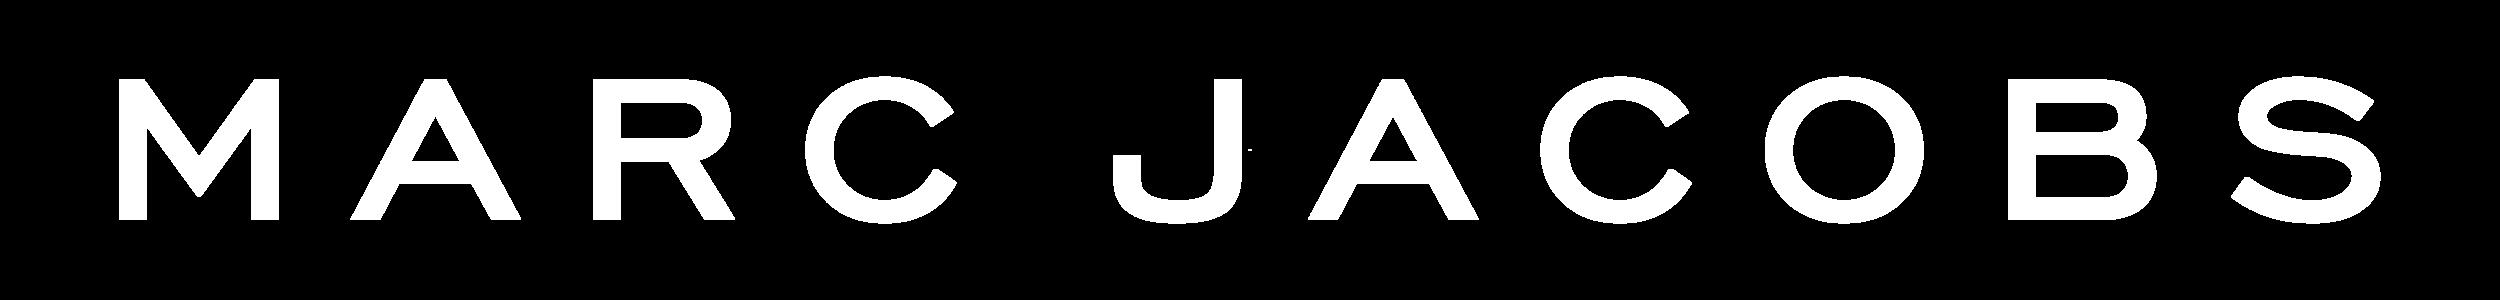 pim-4220-4724-brand-marc-jacobs-logo.png